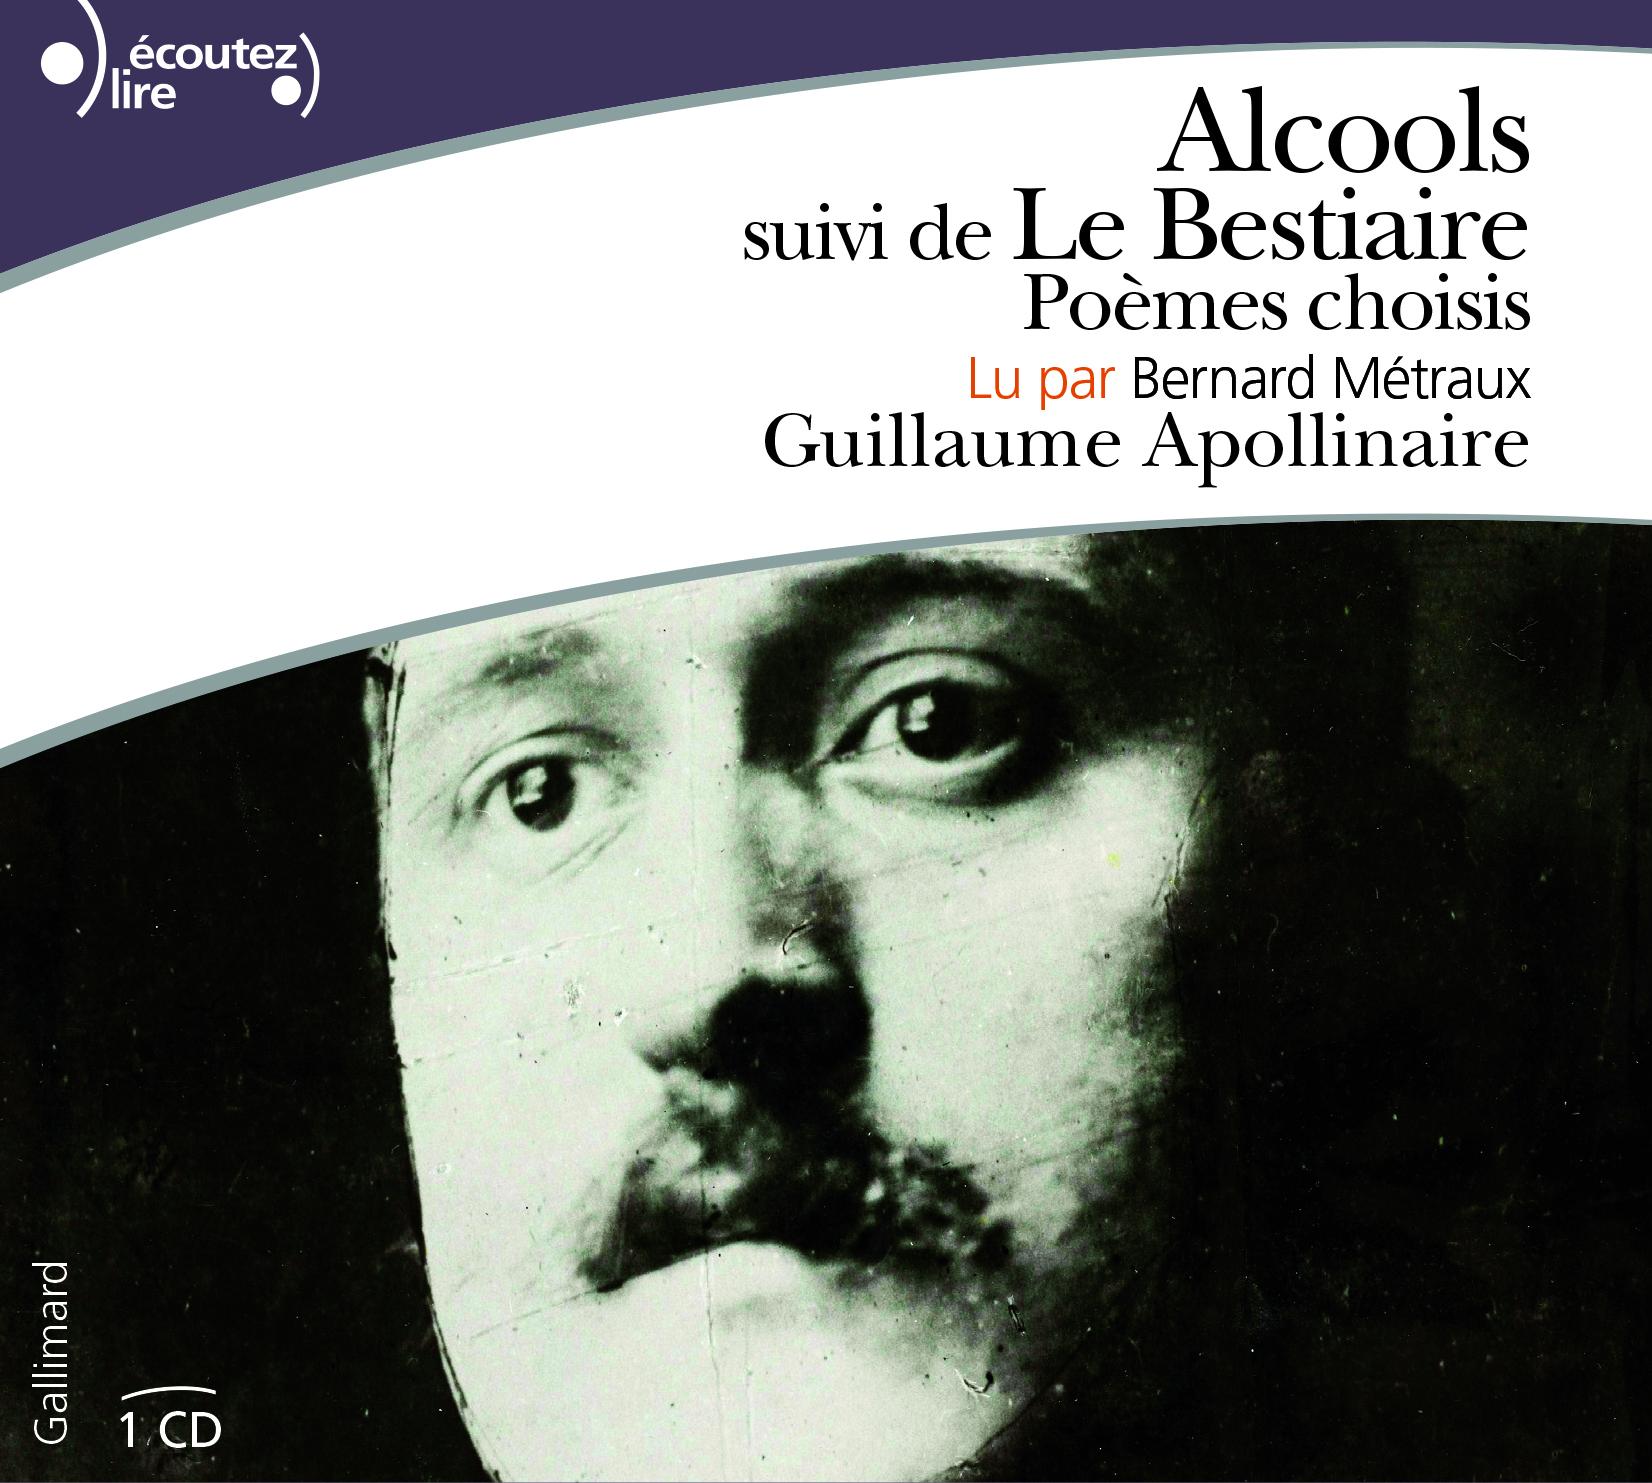 ALCOOLS CD - POEMES CHOISIS